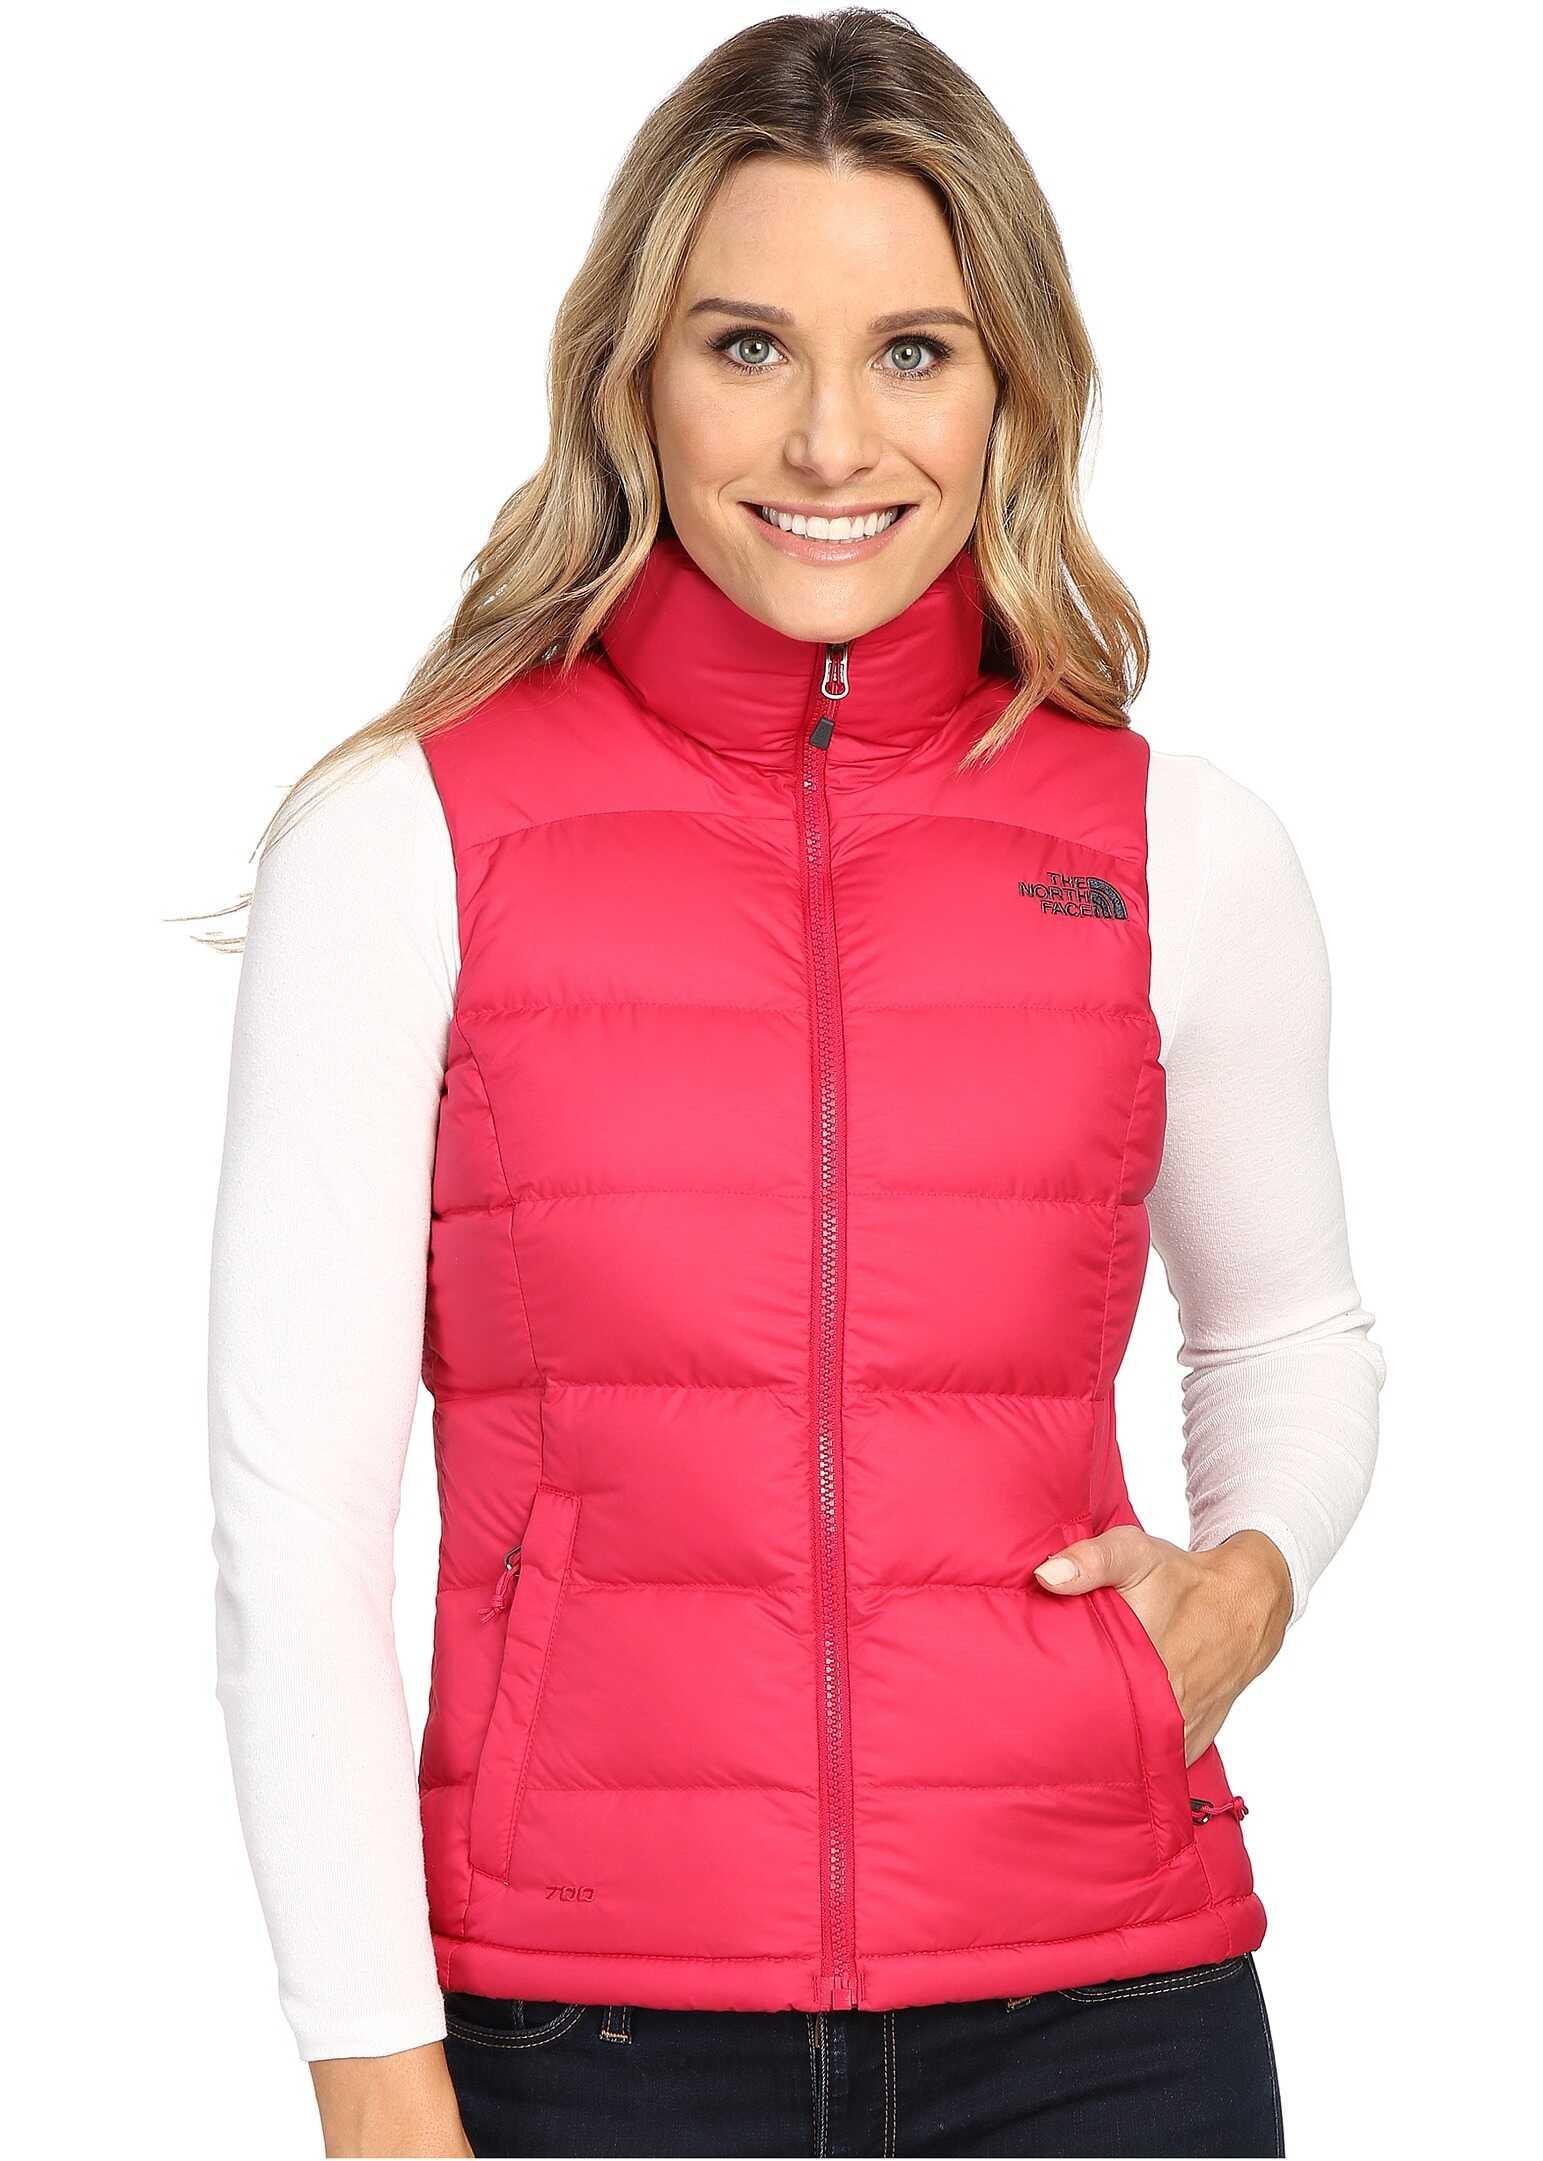 The North Face Nuptse 2 Vest Cerise Pink (Prior Season)